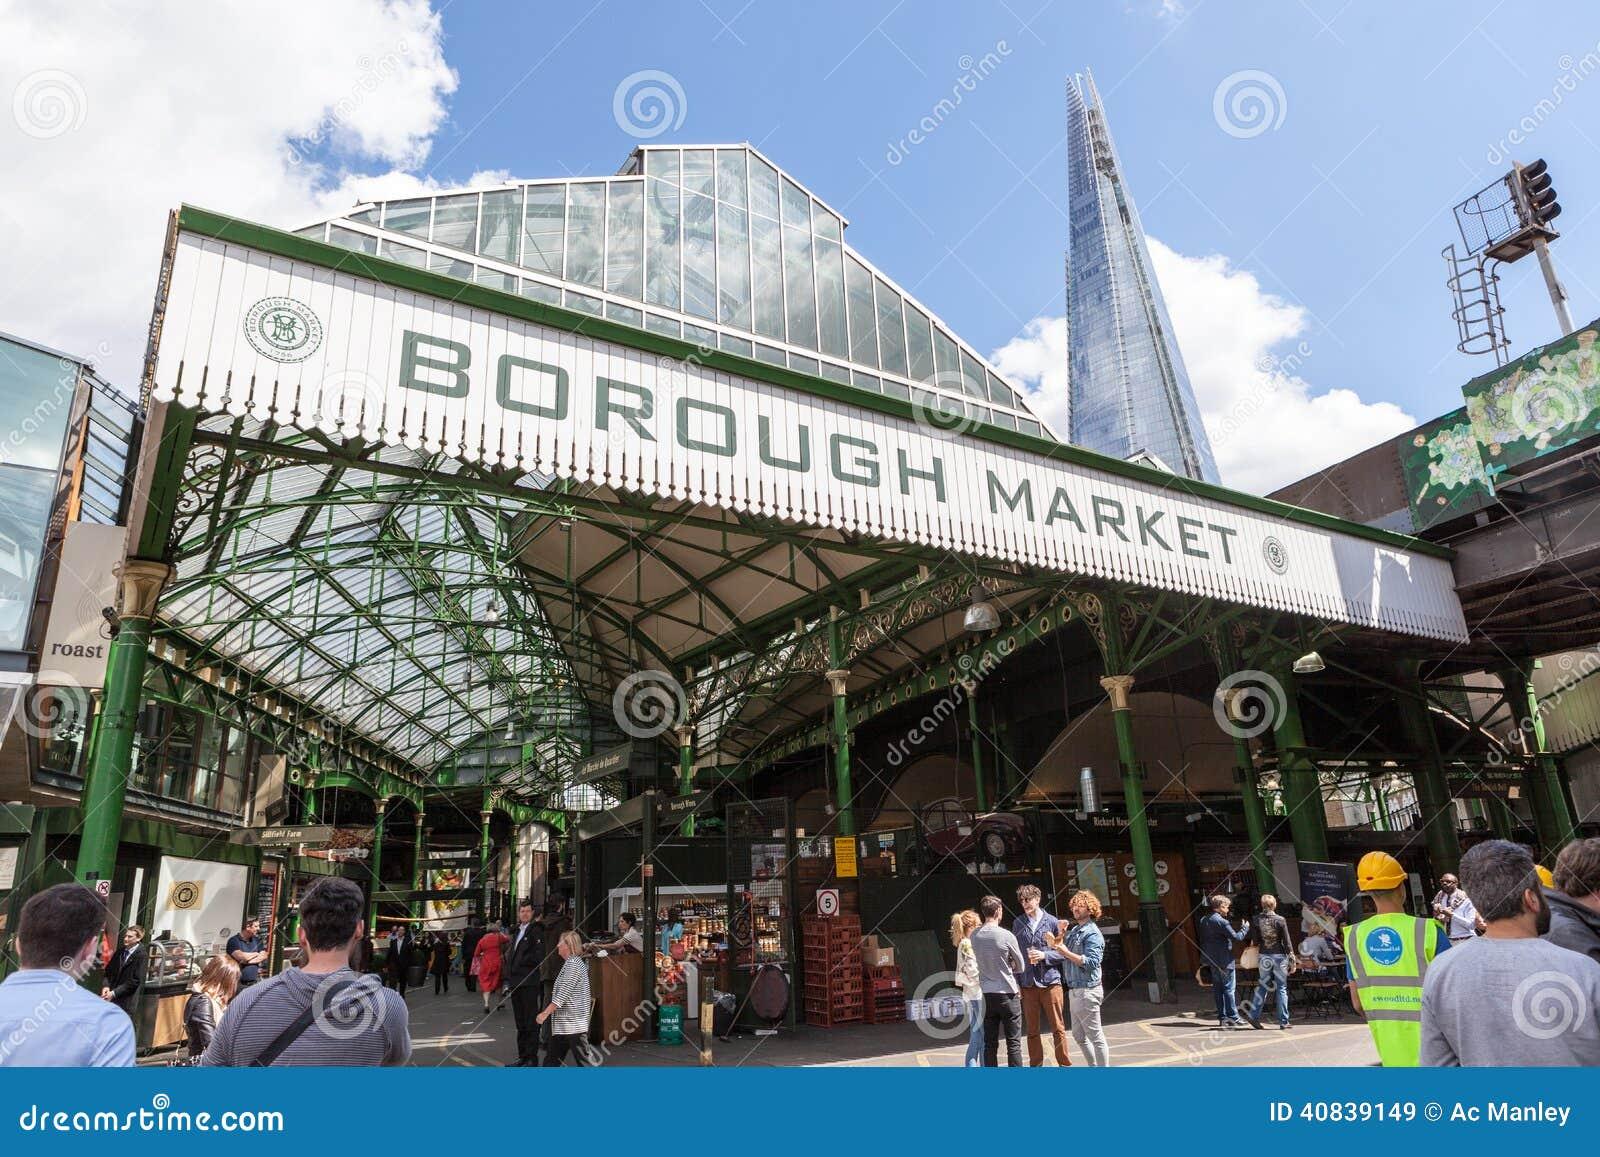 Food Market Near London Bridge